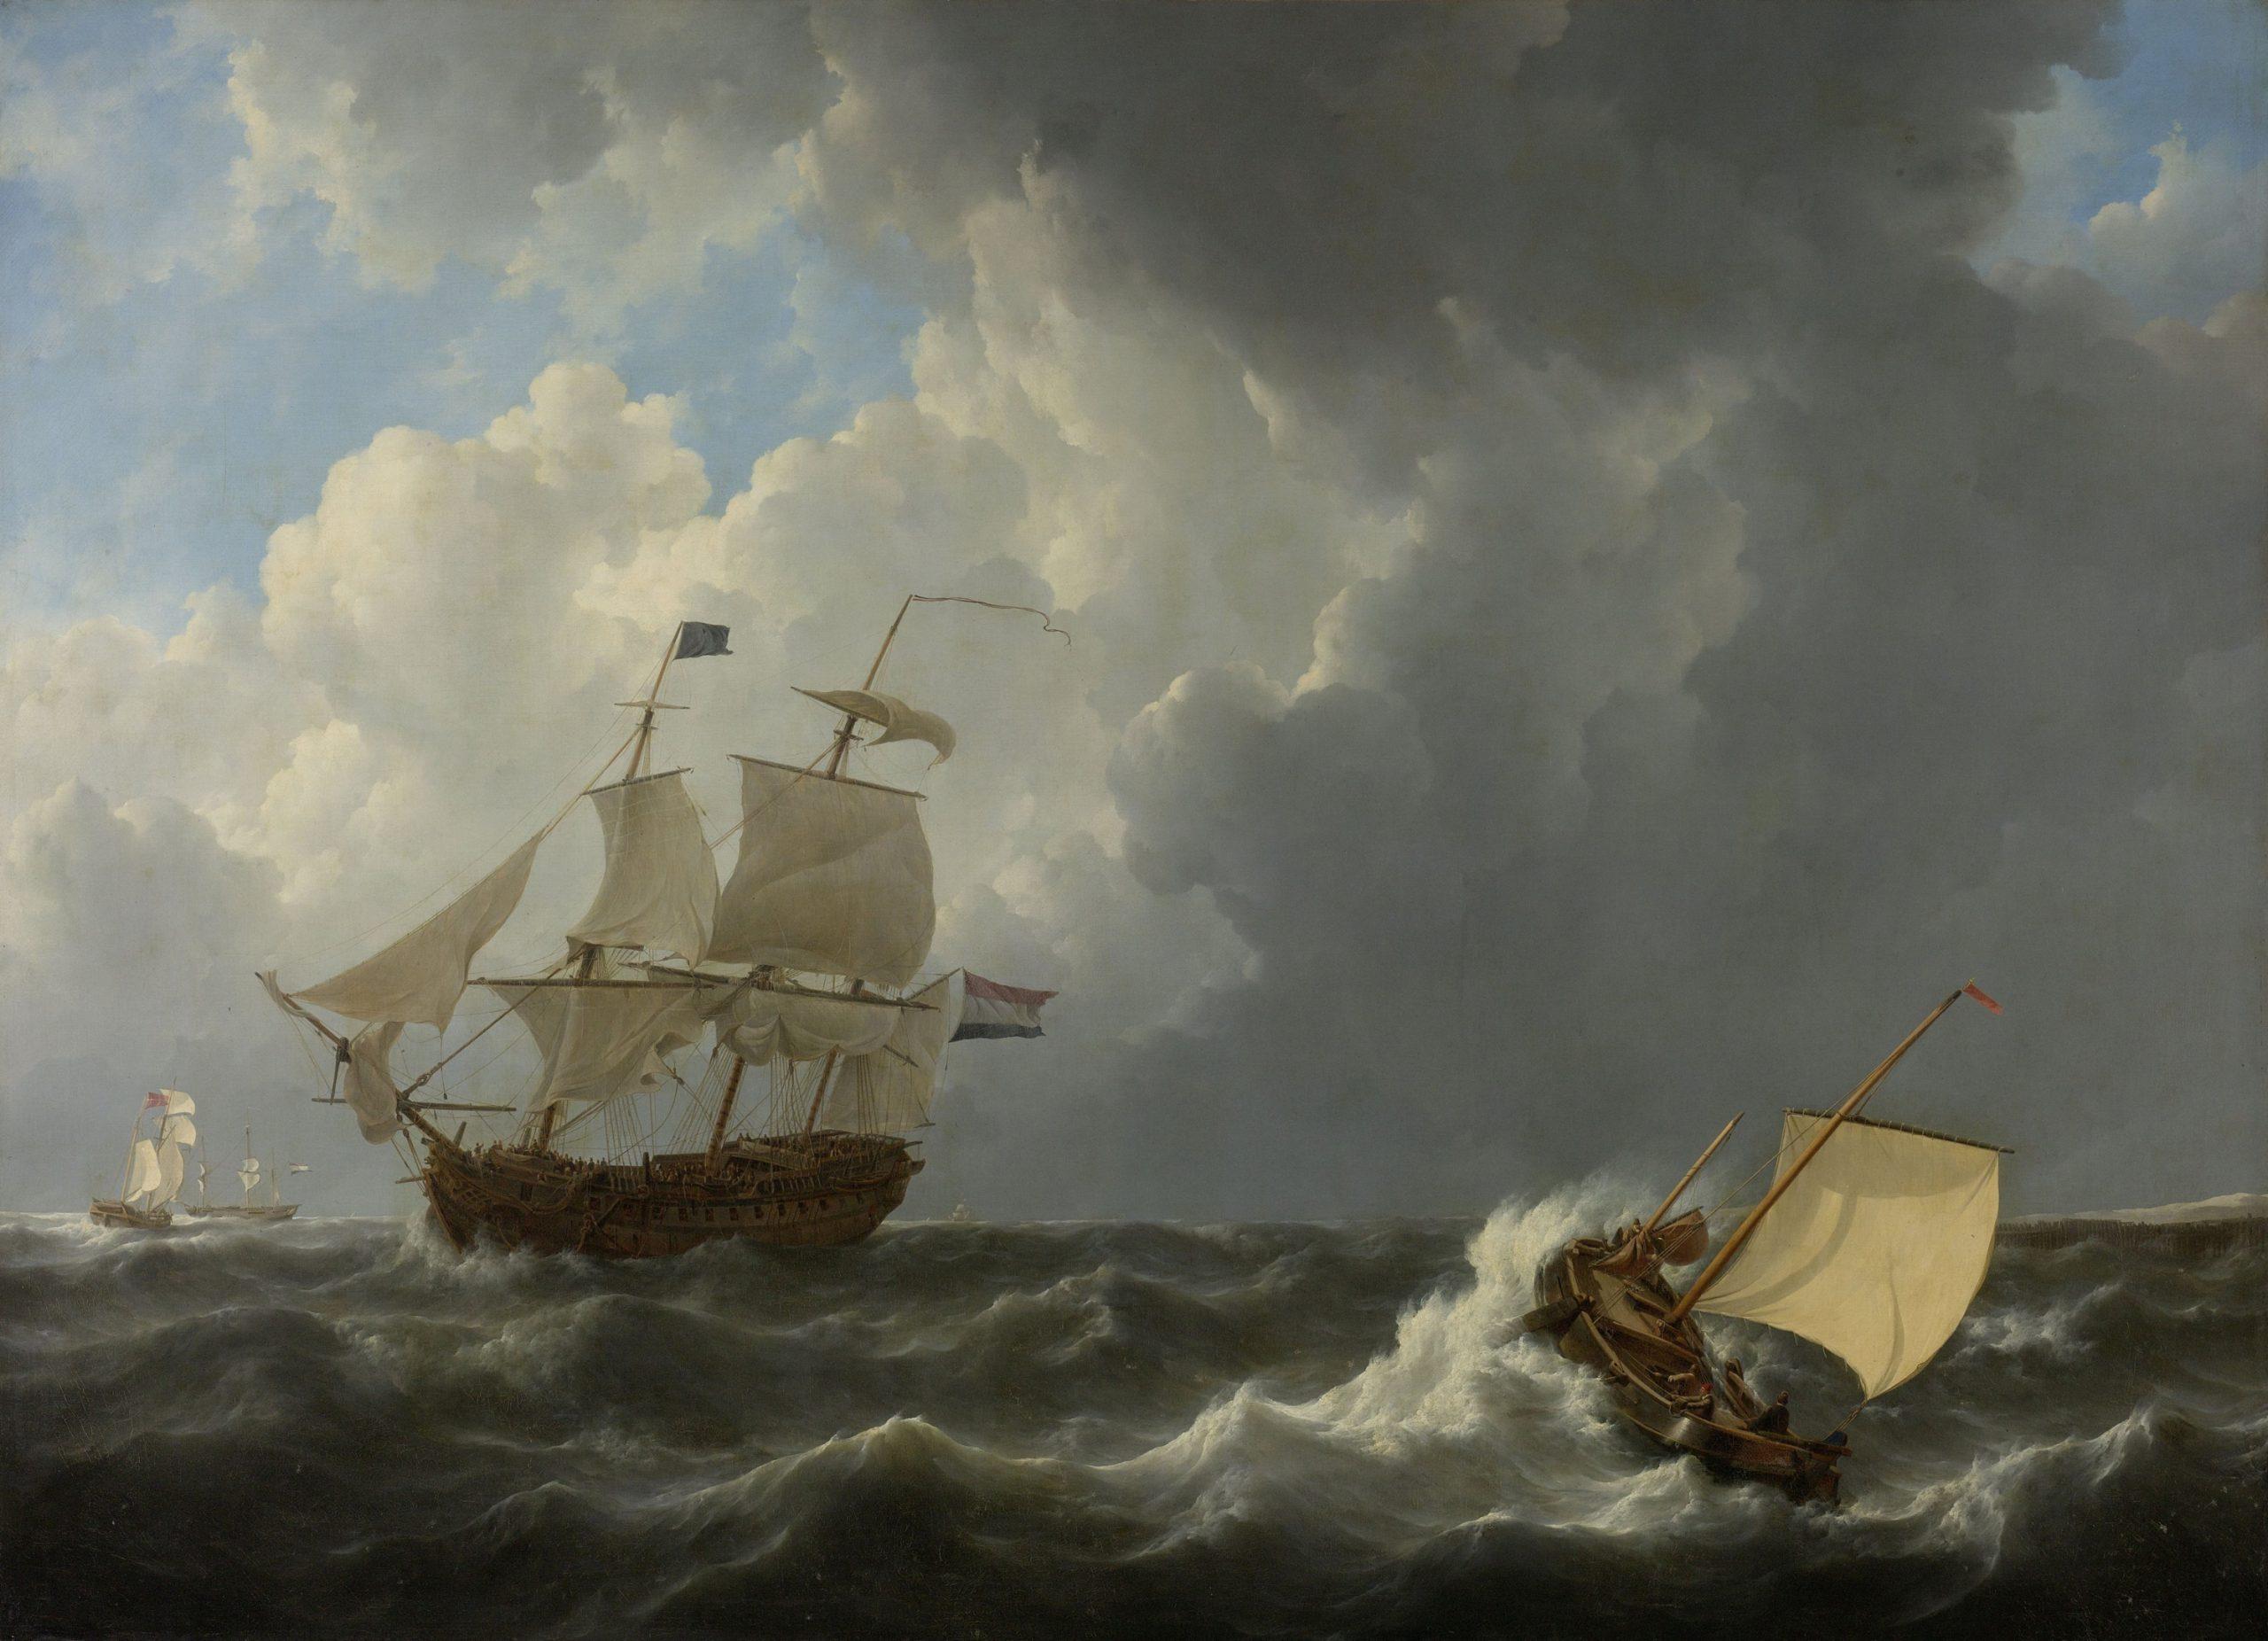 Sailing choppy waters